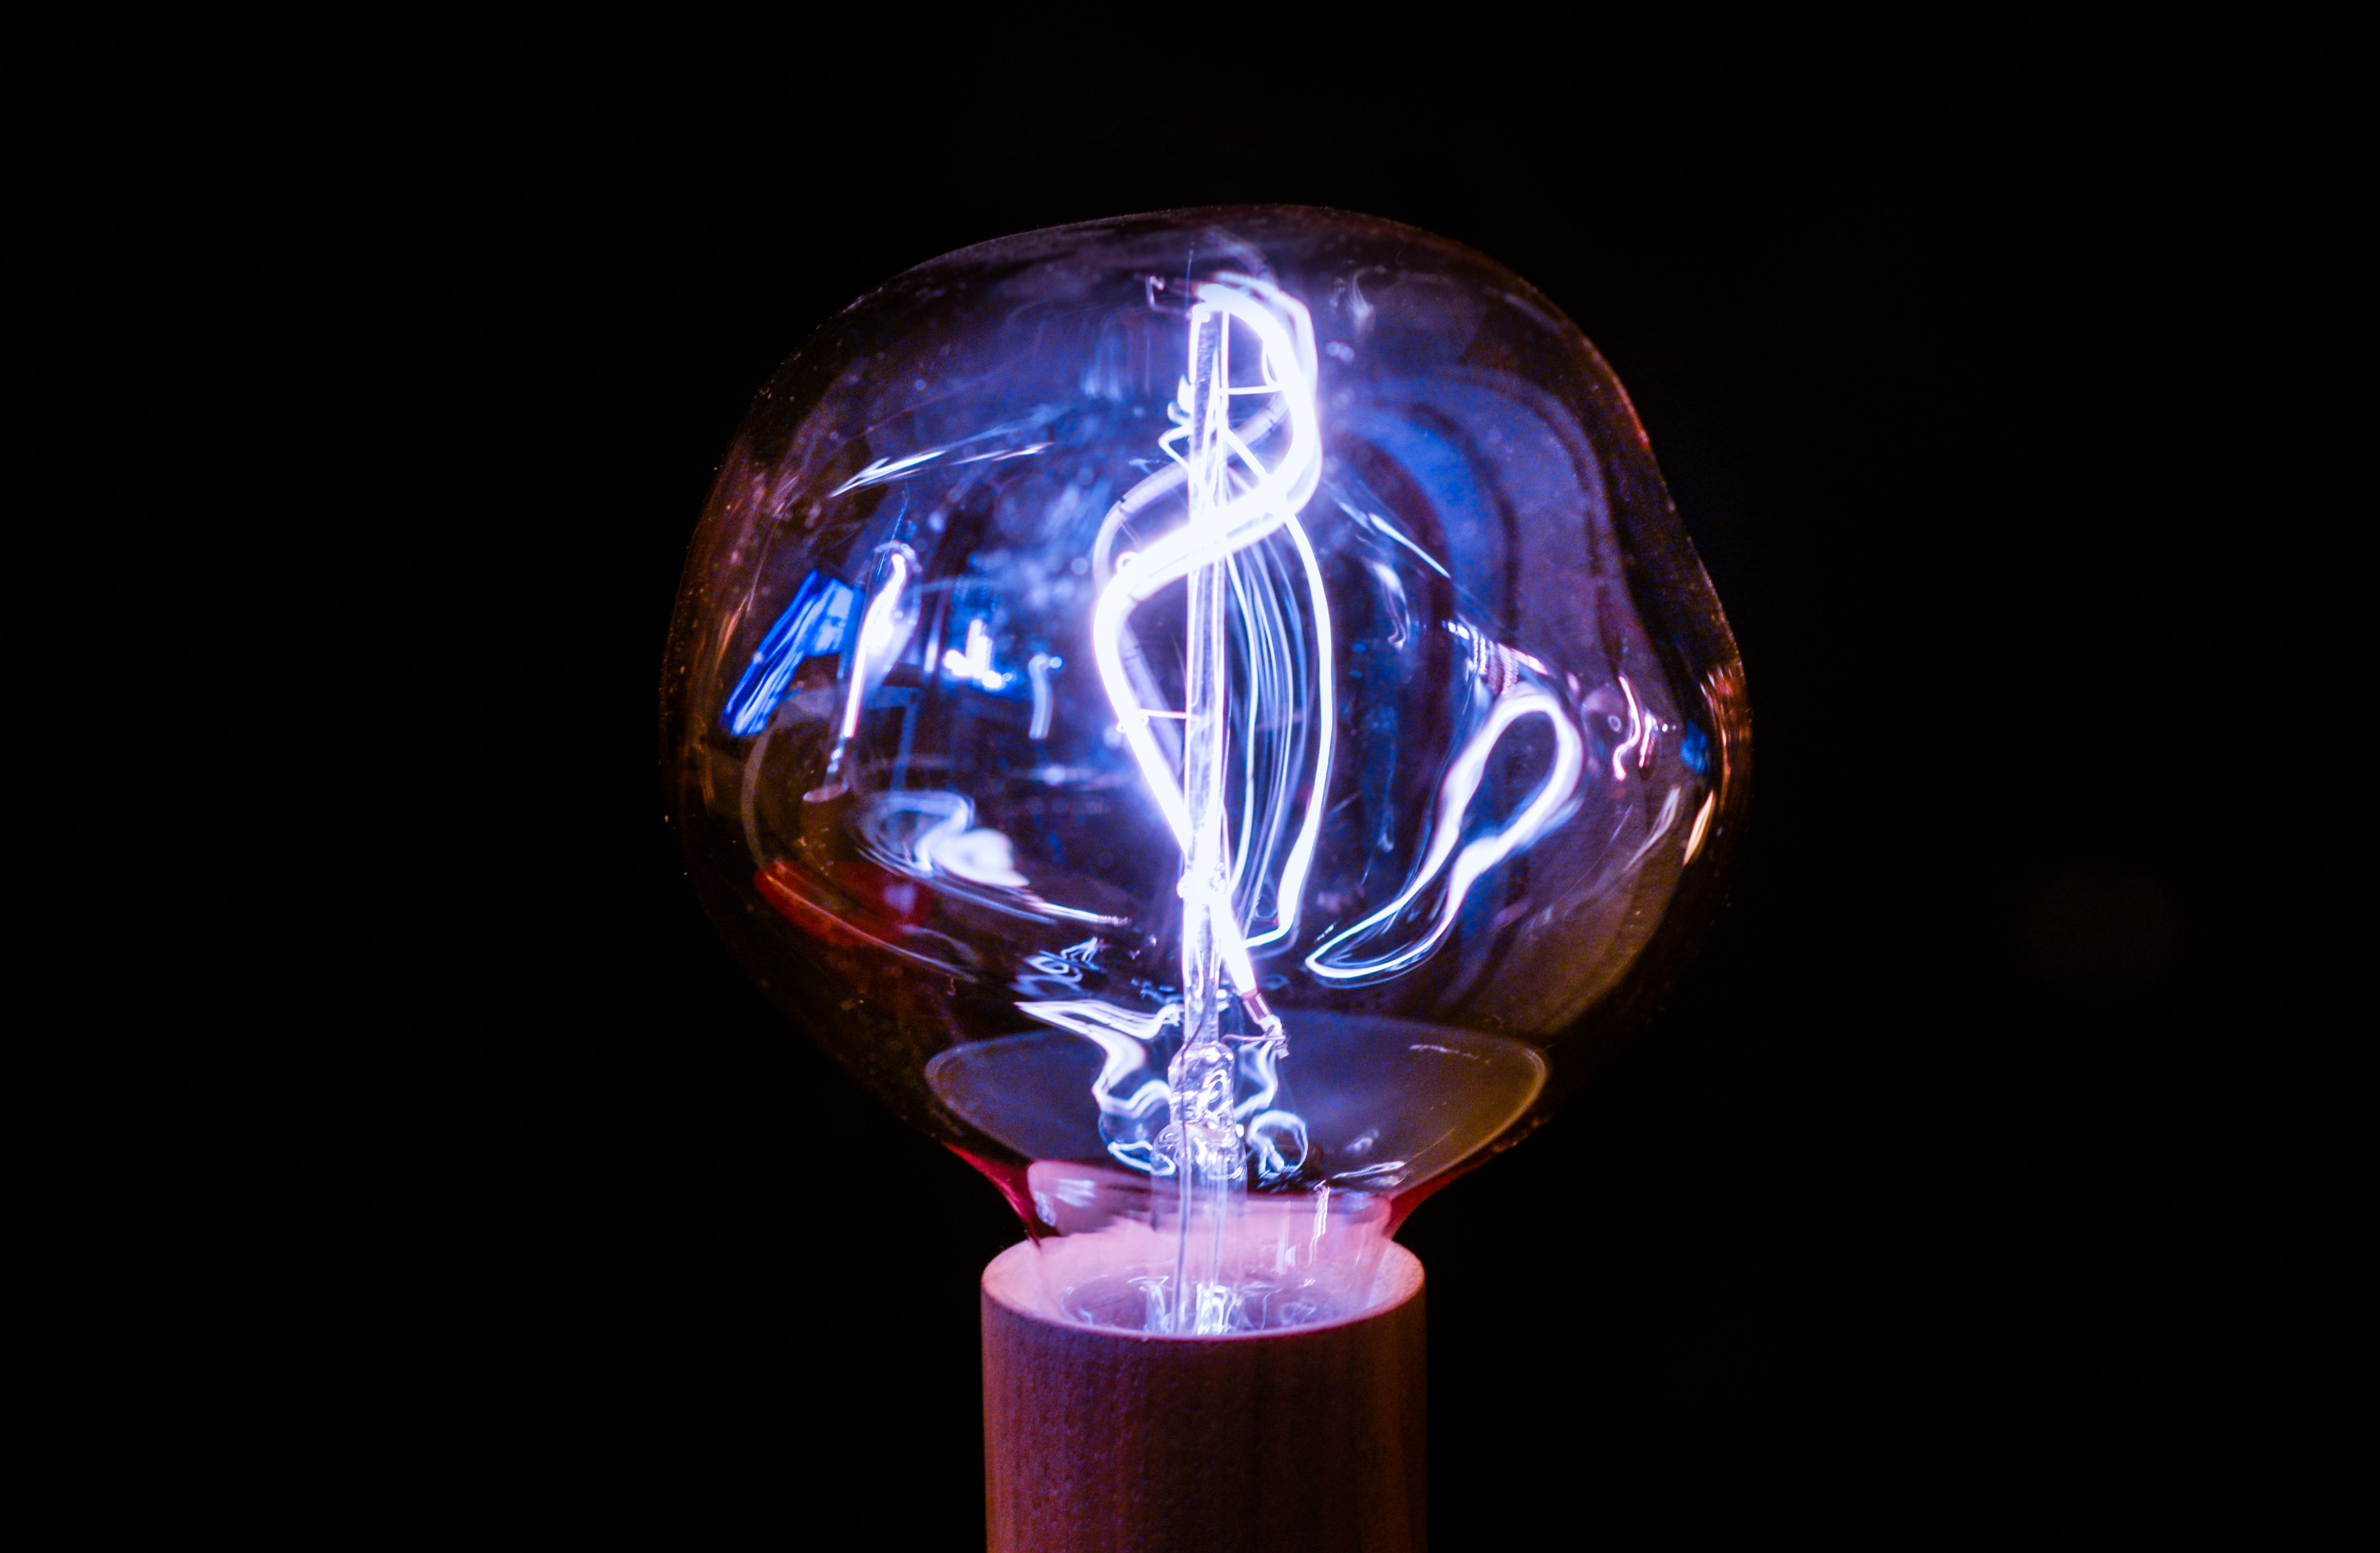 abstract-ball-shaped-bright-745708